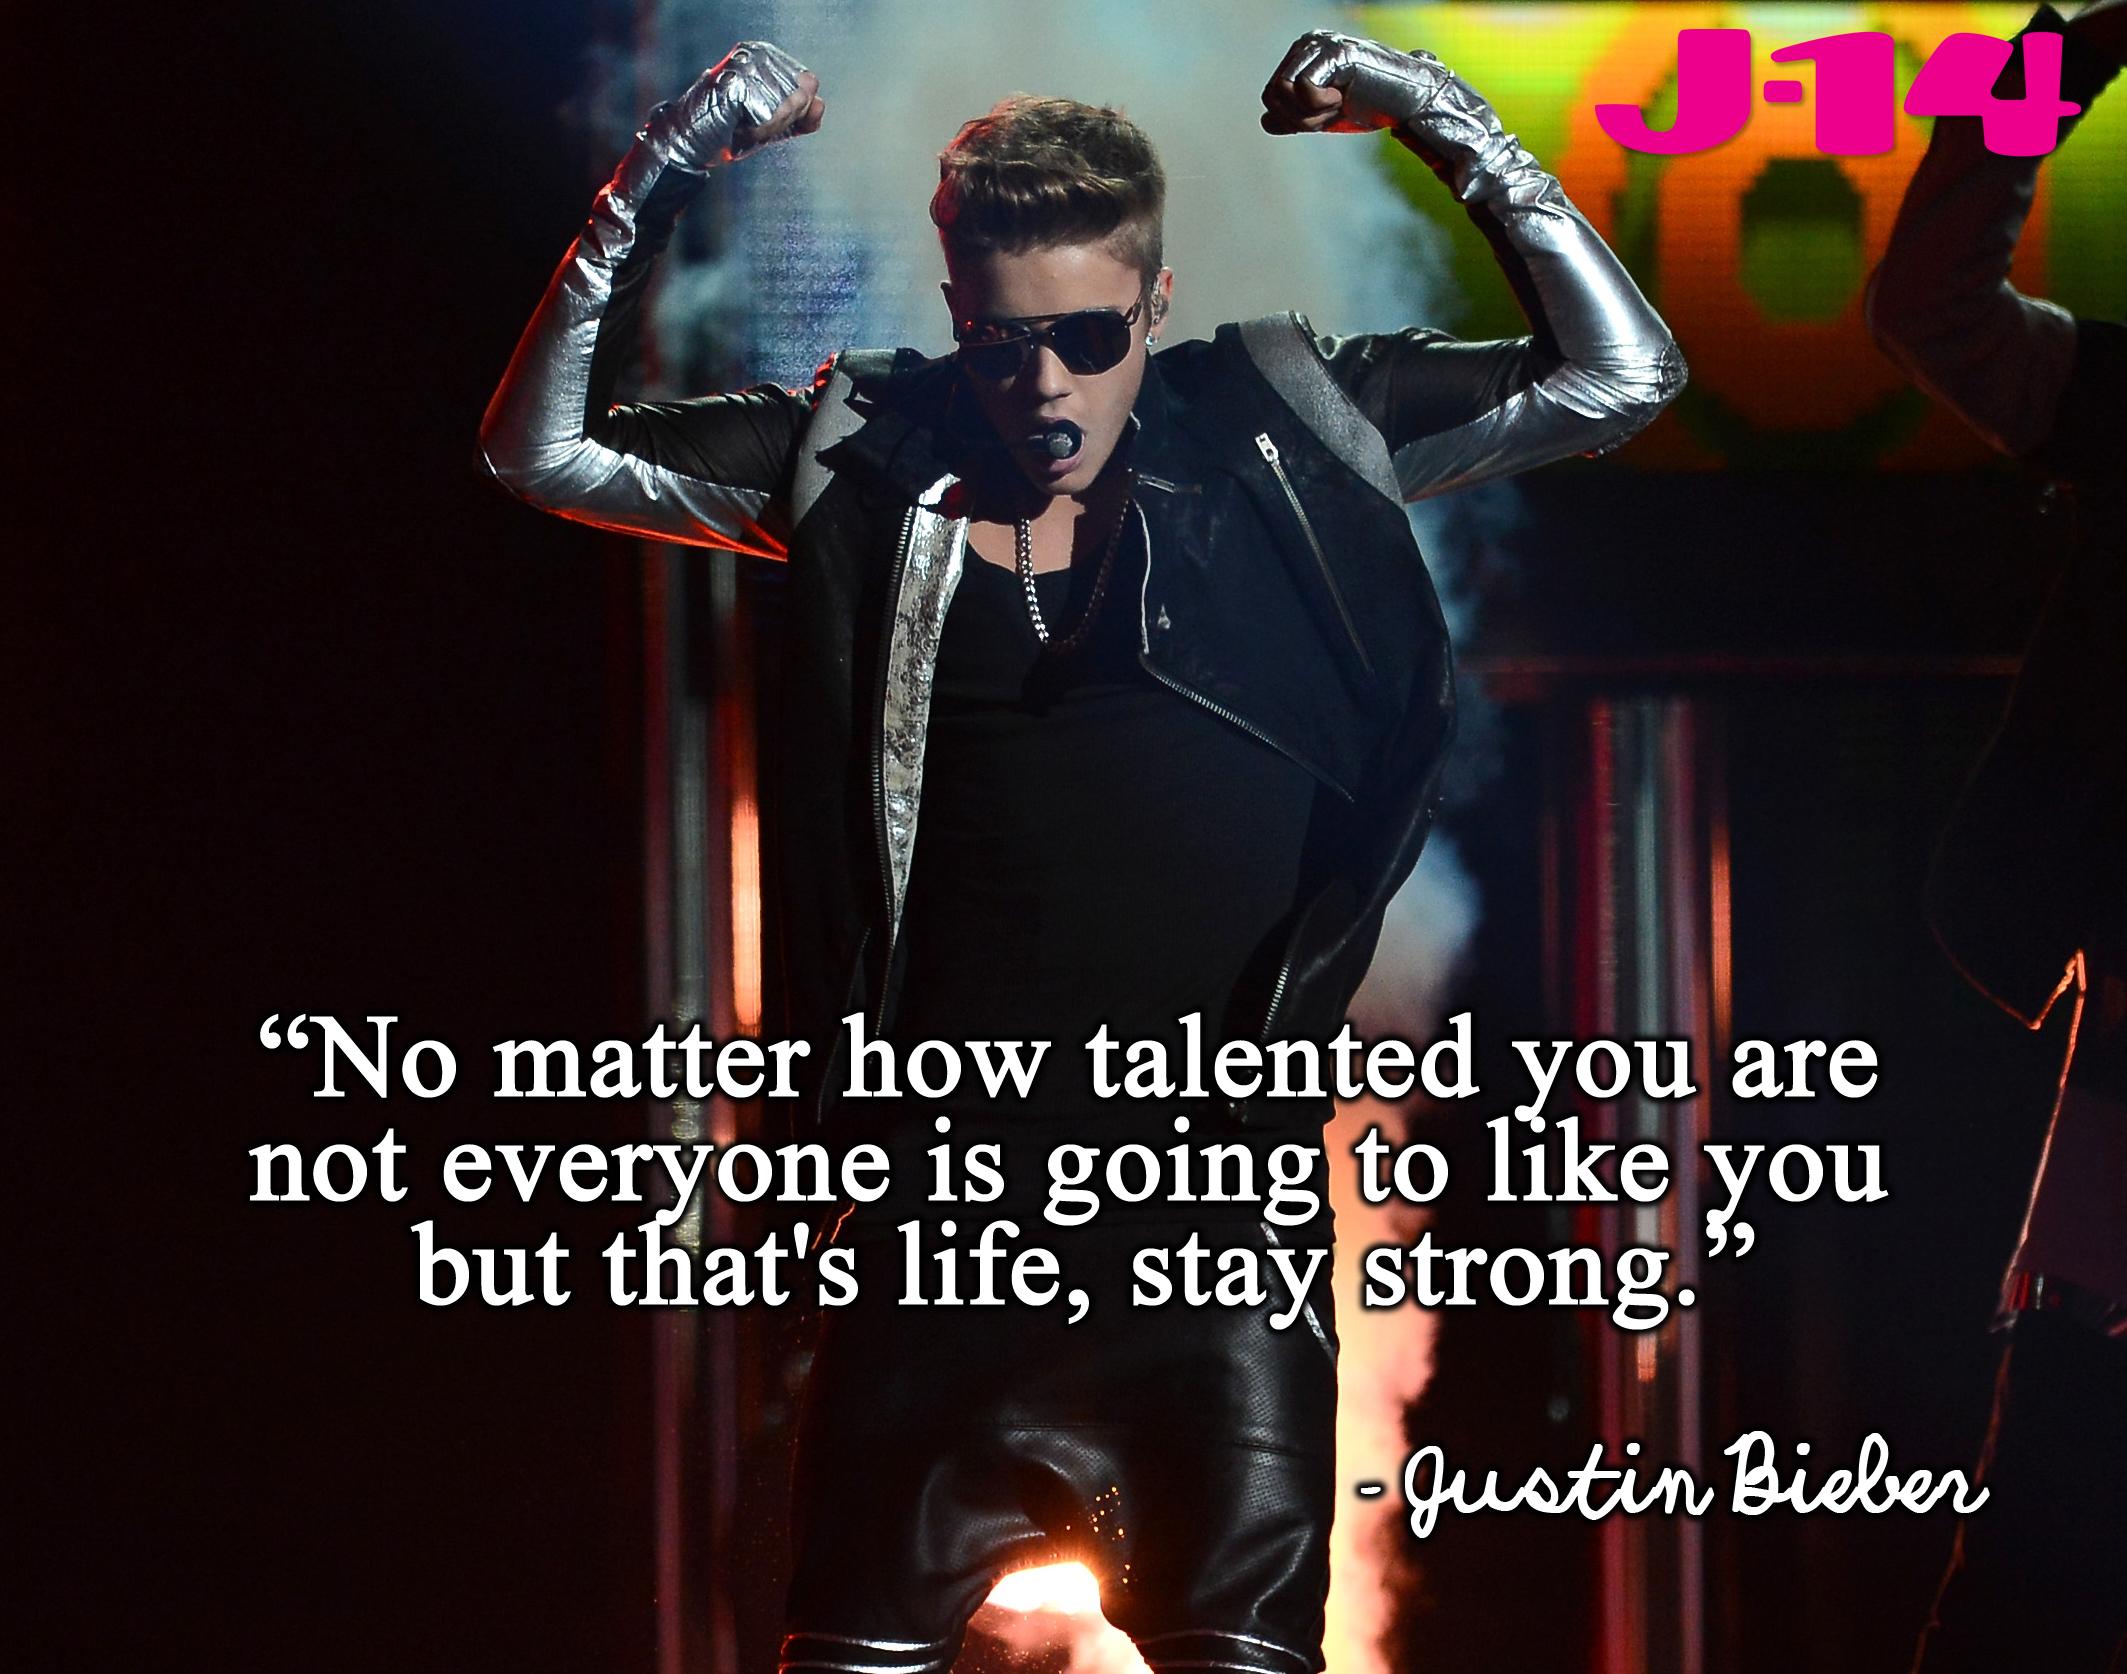 justin-bieber-inspiring-quote-new-10